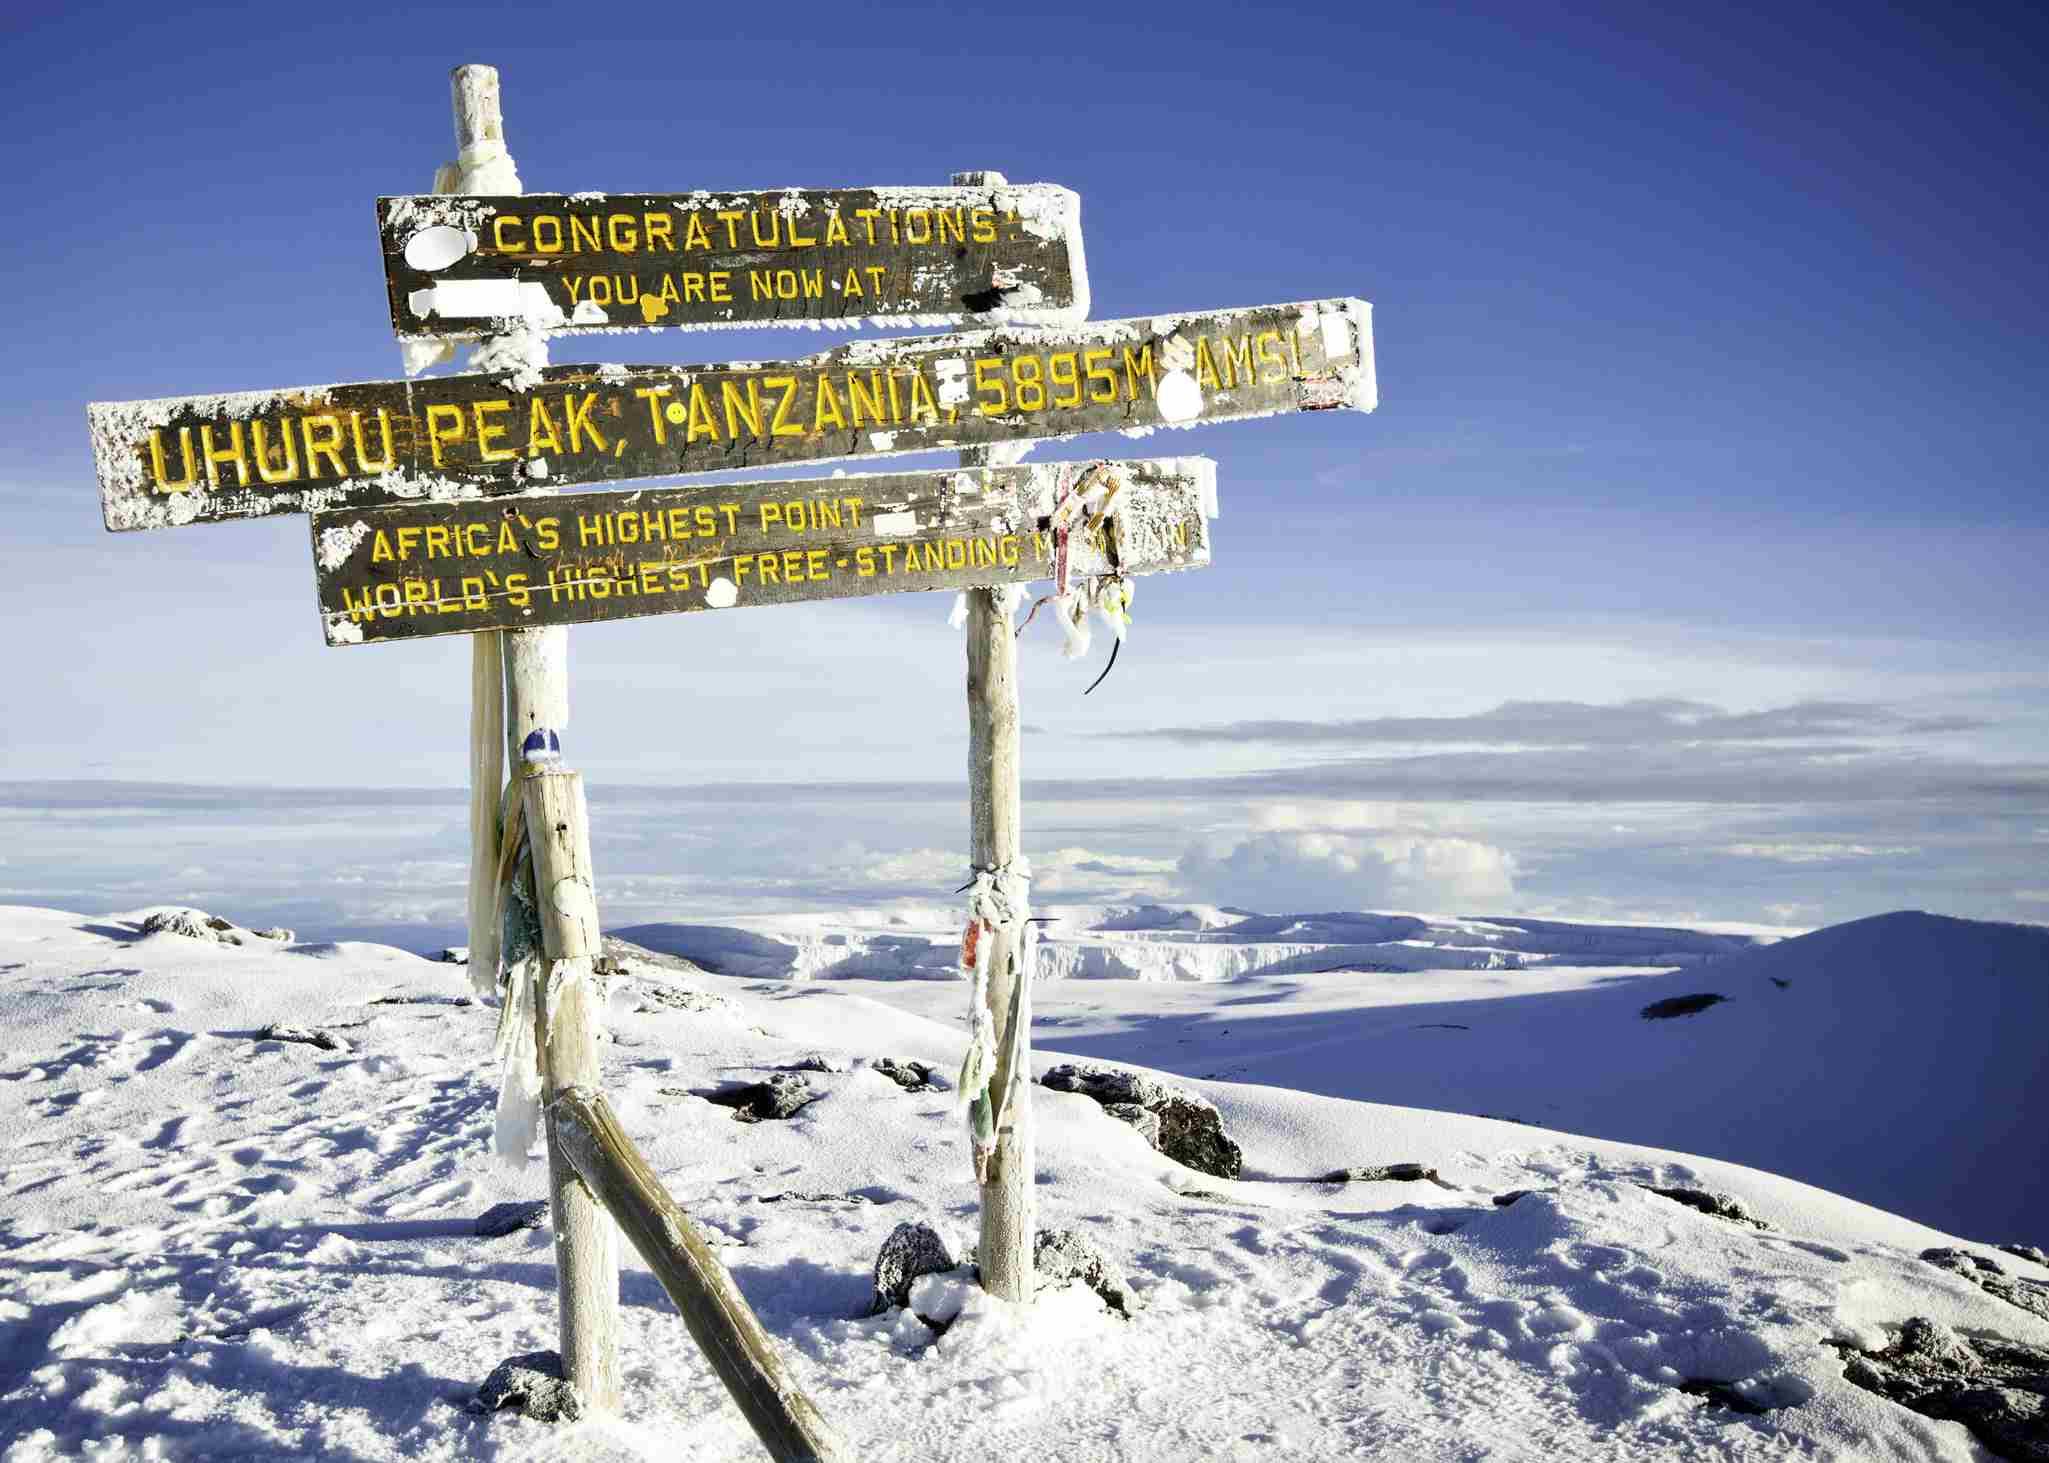 The sign at the summit of Kilimanjaro in Tanzania